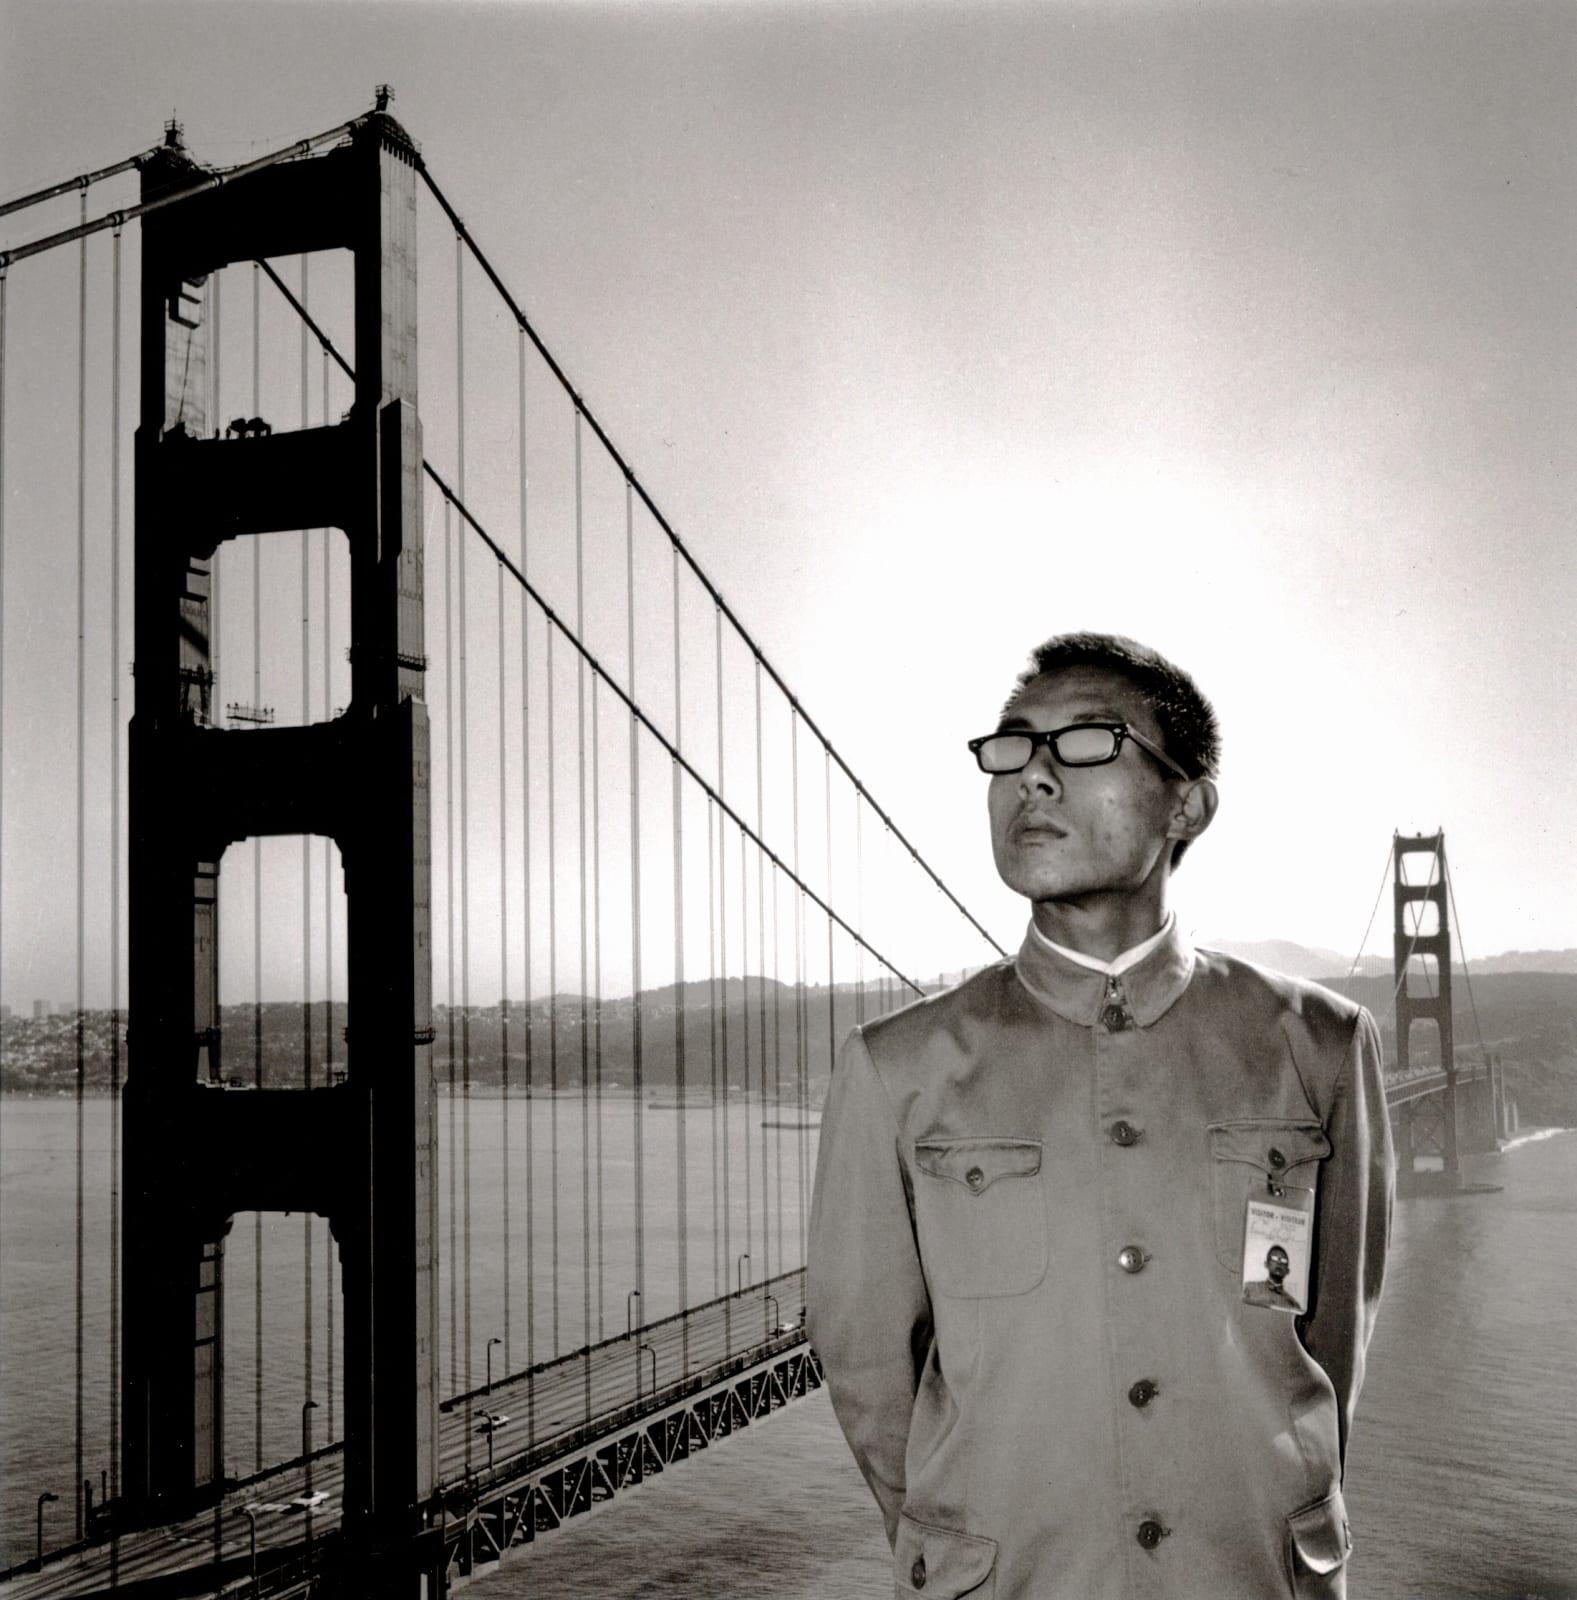 Tseng Kwong Chi (1950 - 1990), San Francisco, California (Golden Gate Bridge), 1979